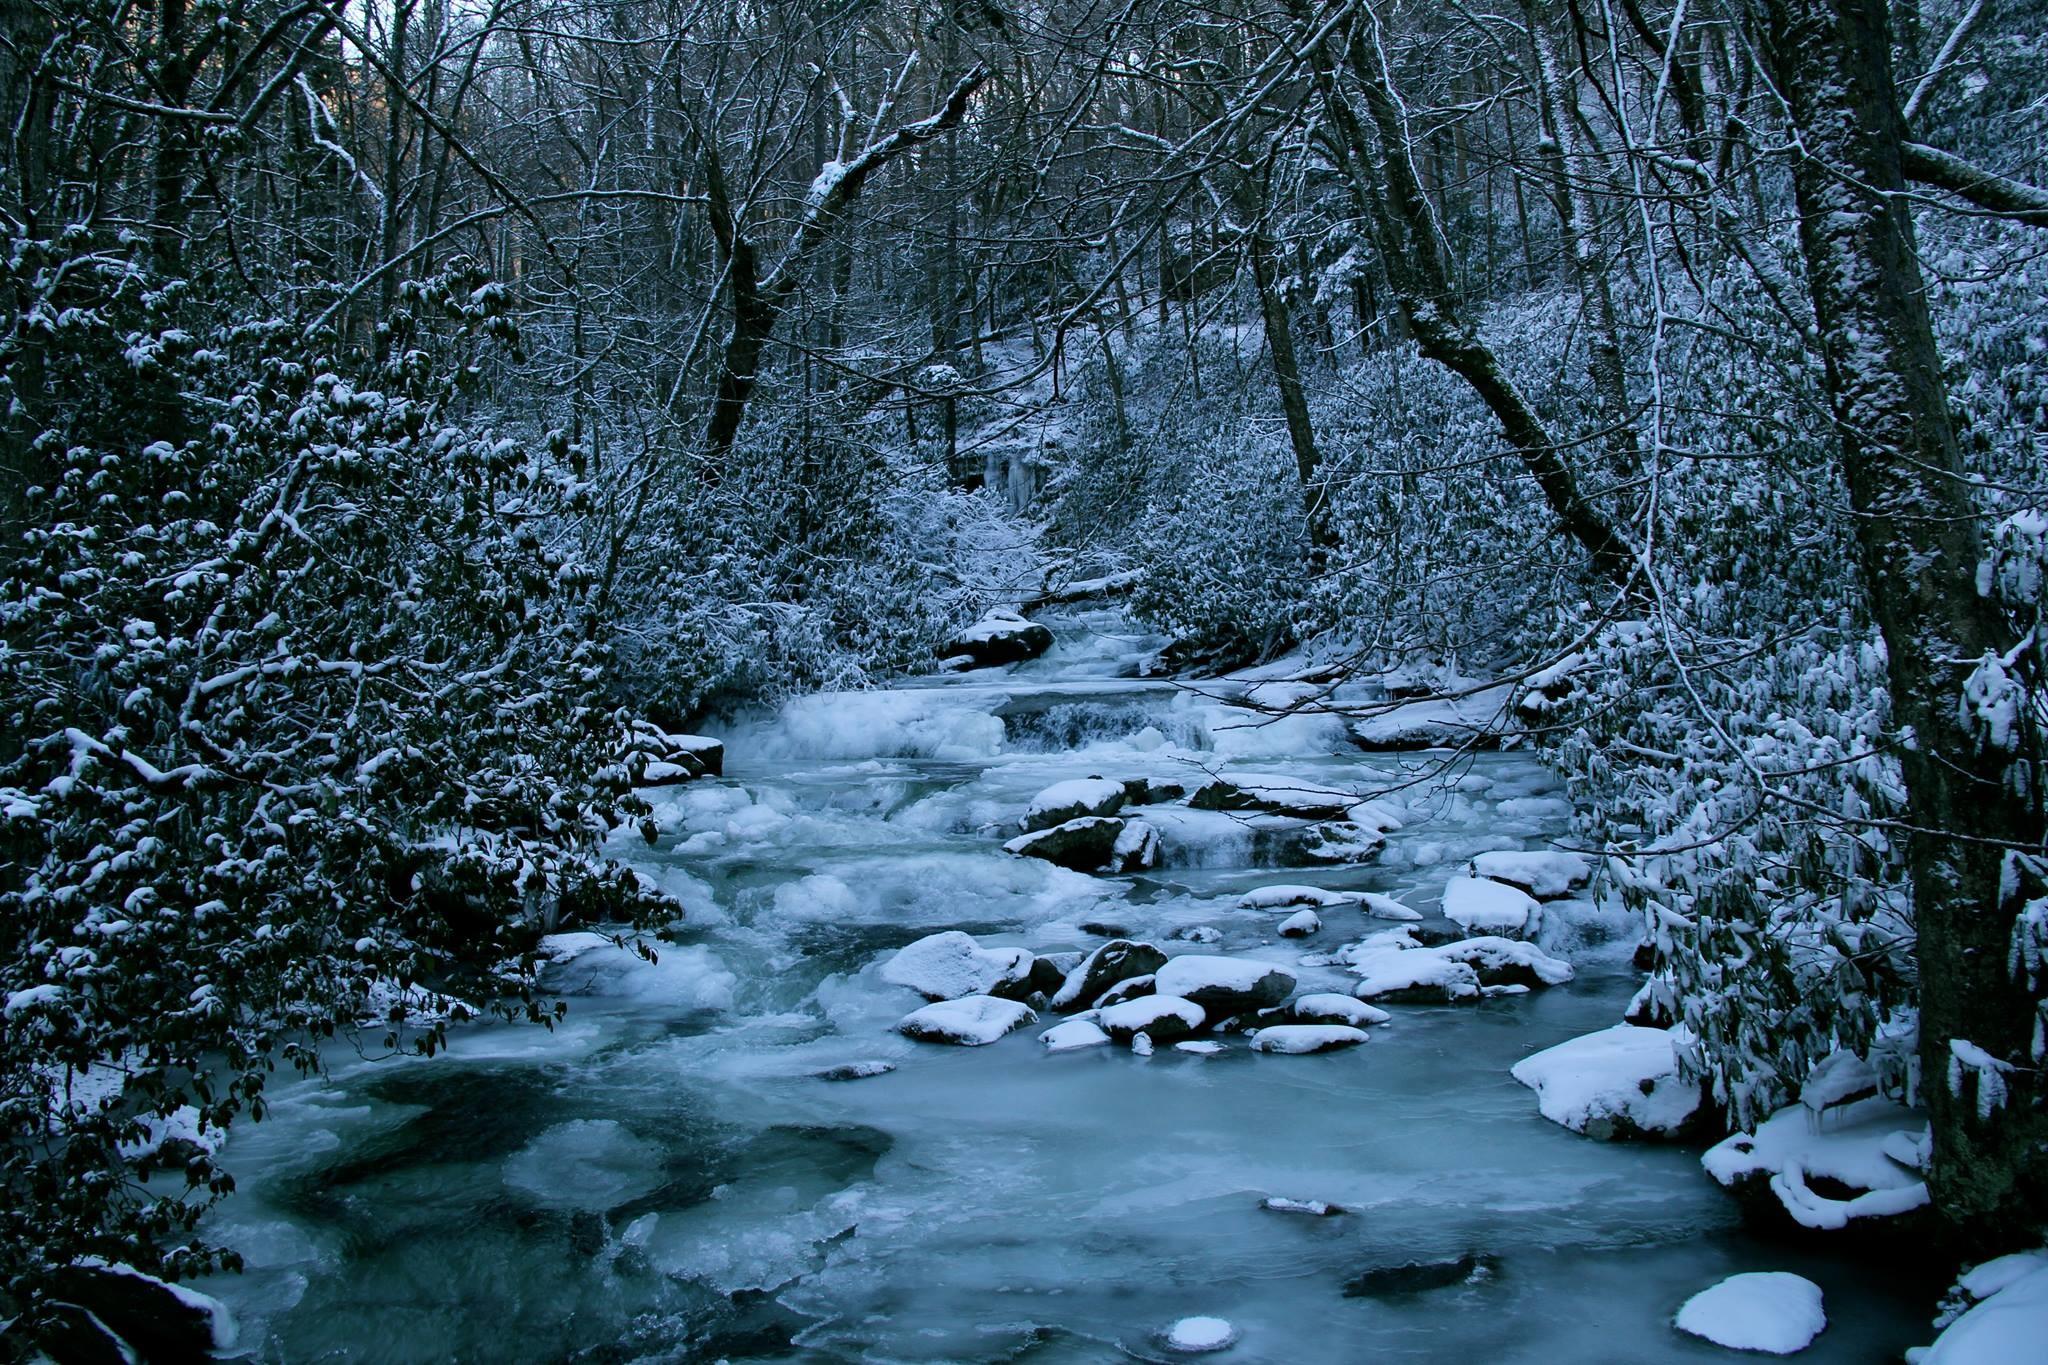 Smoky Mountain Winter Scenes Wallpaper (42+ images)